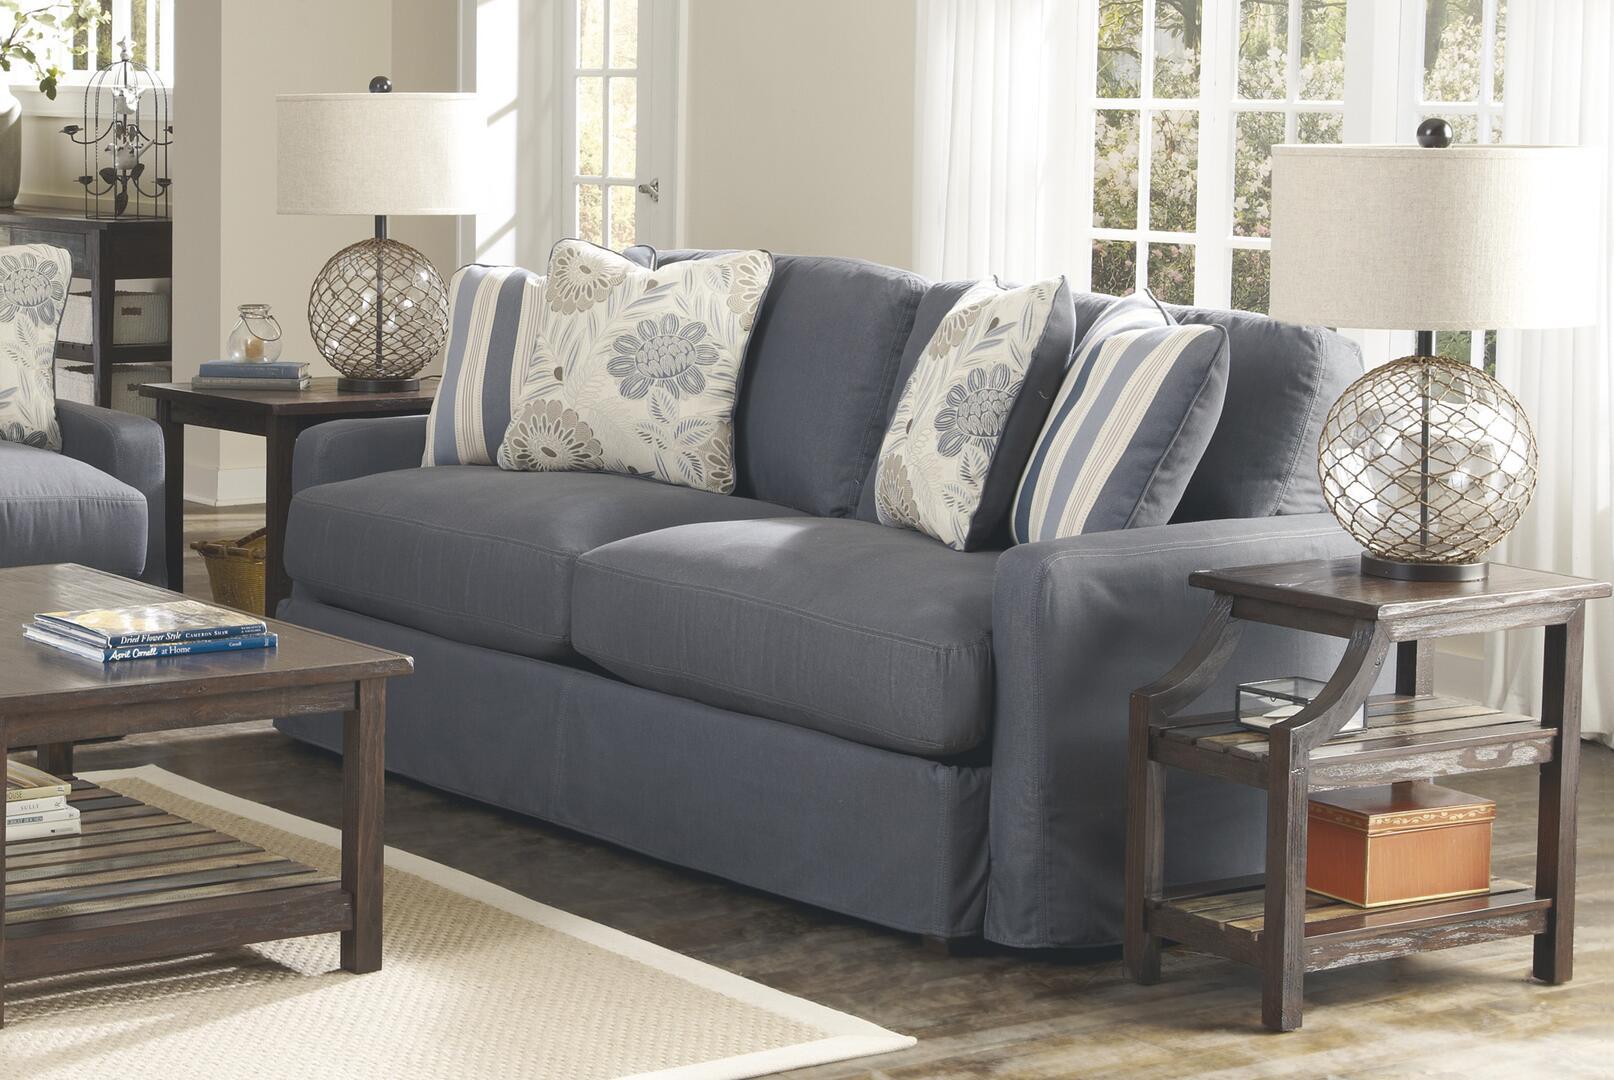 addison sofa ashley furniture 2 piece and loveseat set signature design by 7880138 series